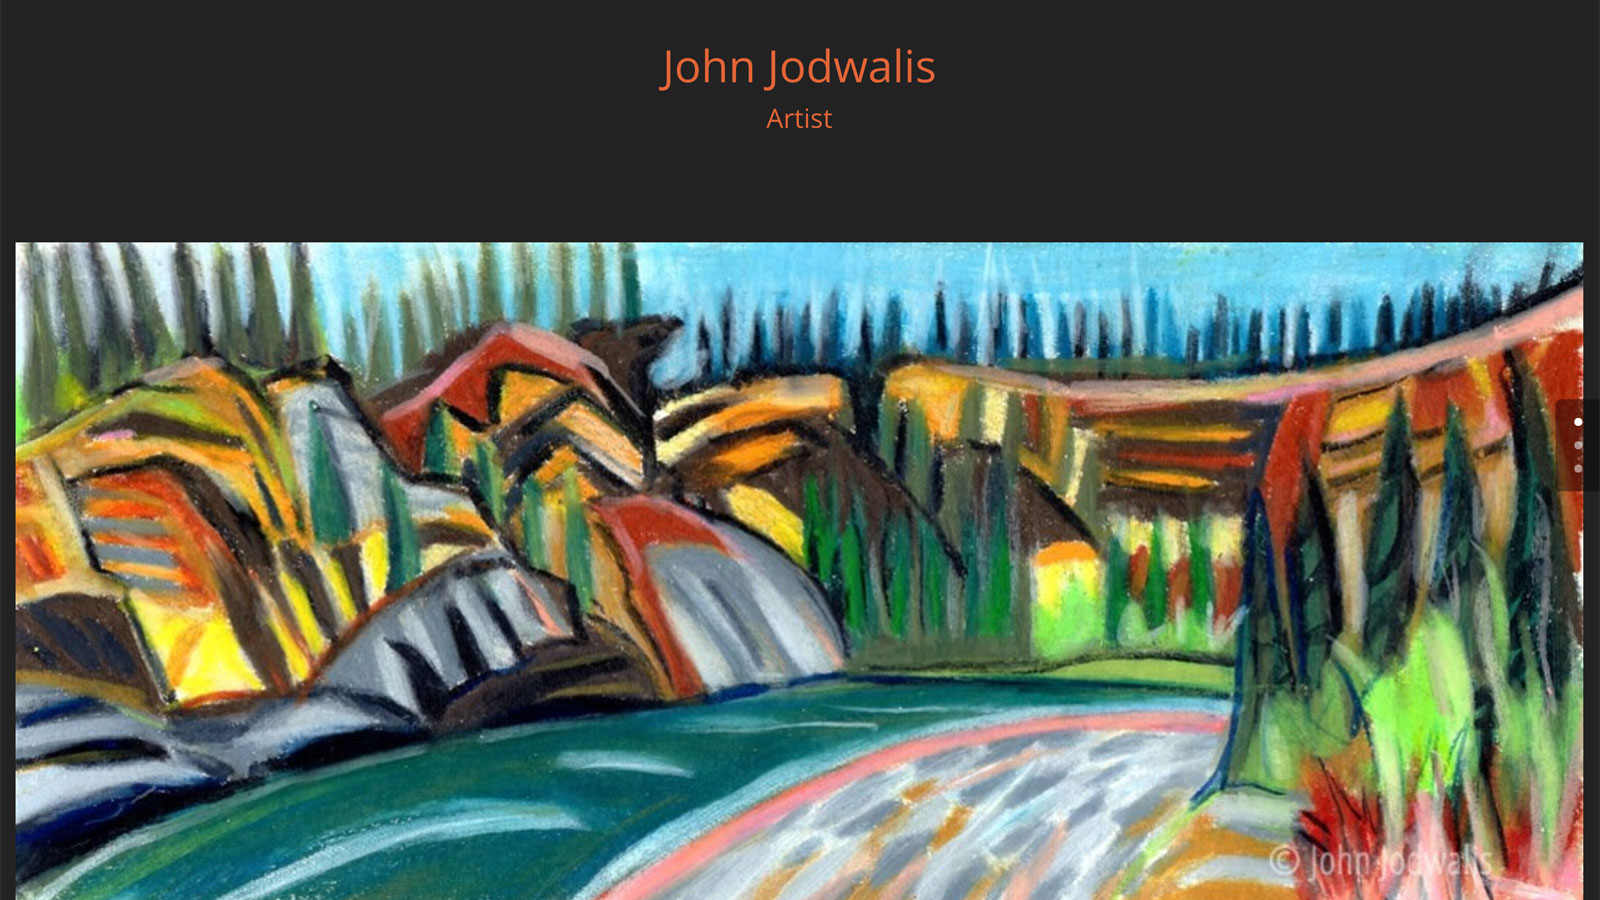 John Jodwalis – Artist